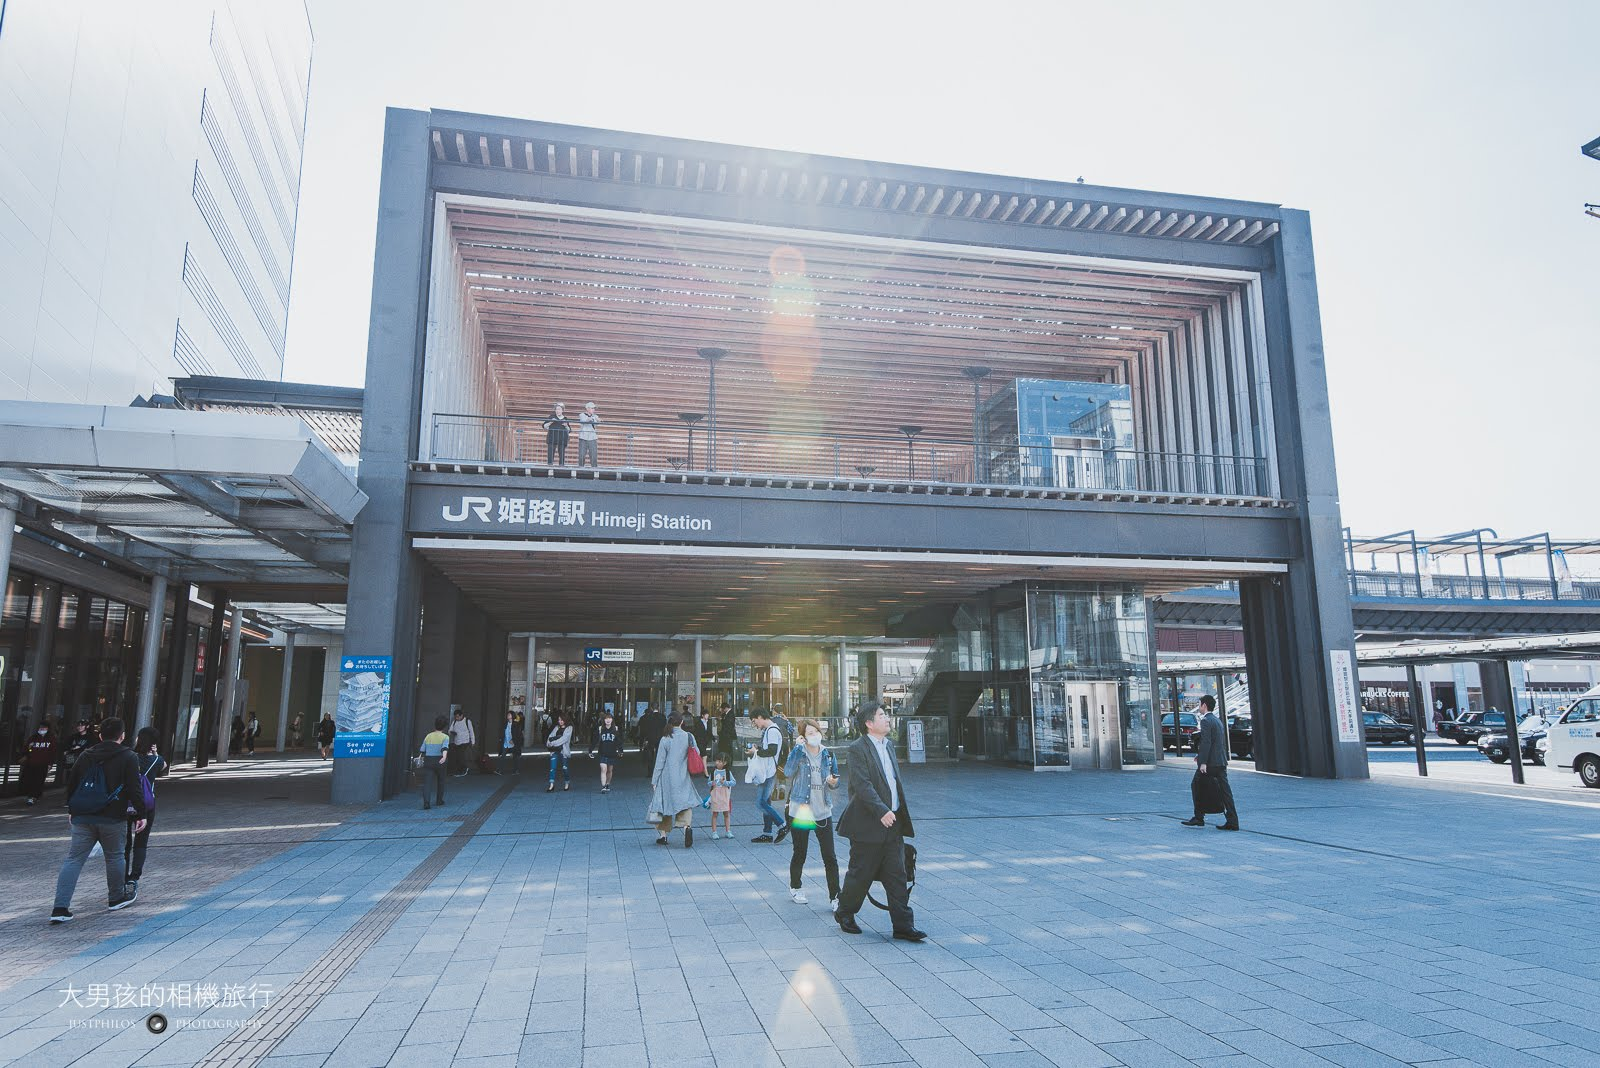 JR姬路站是相當現代化的一個車站,山陽新幹線也有停靠。